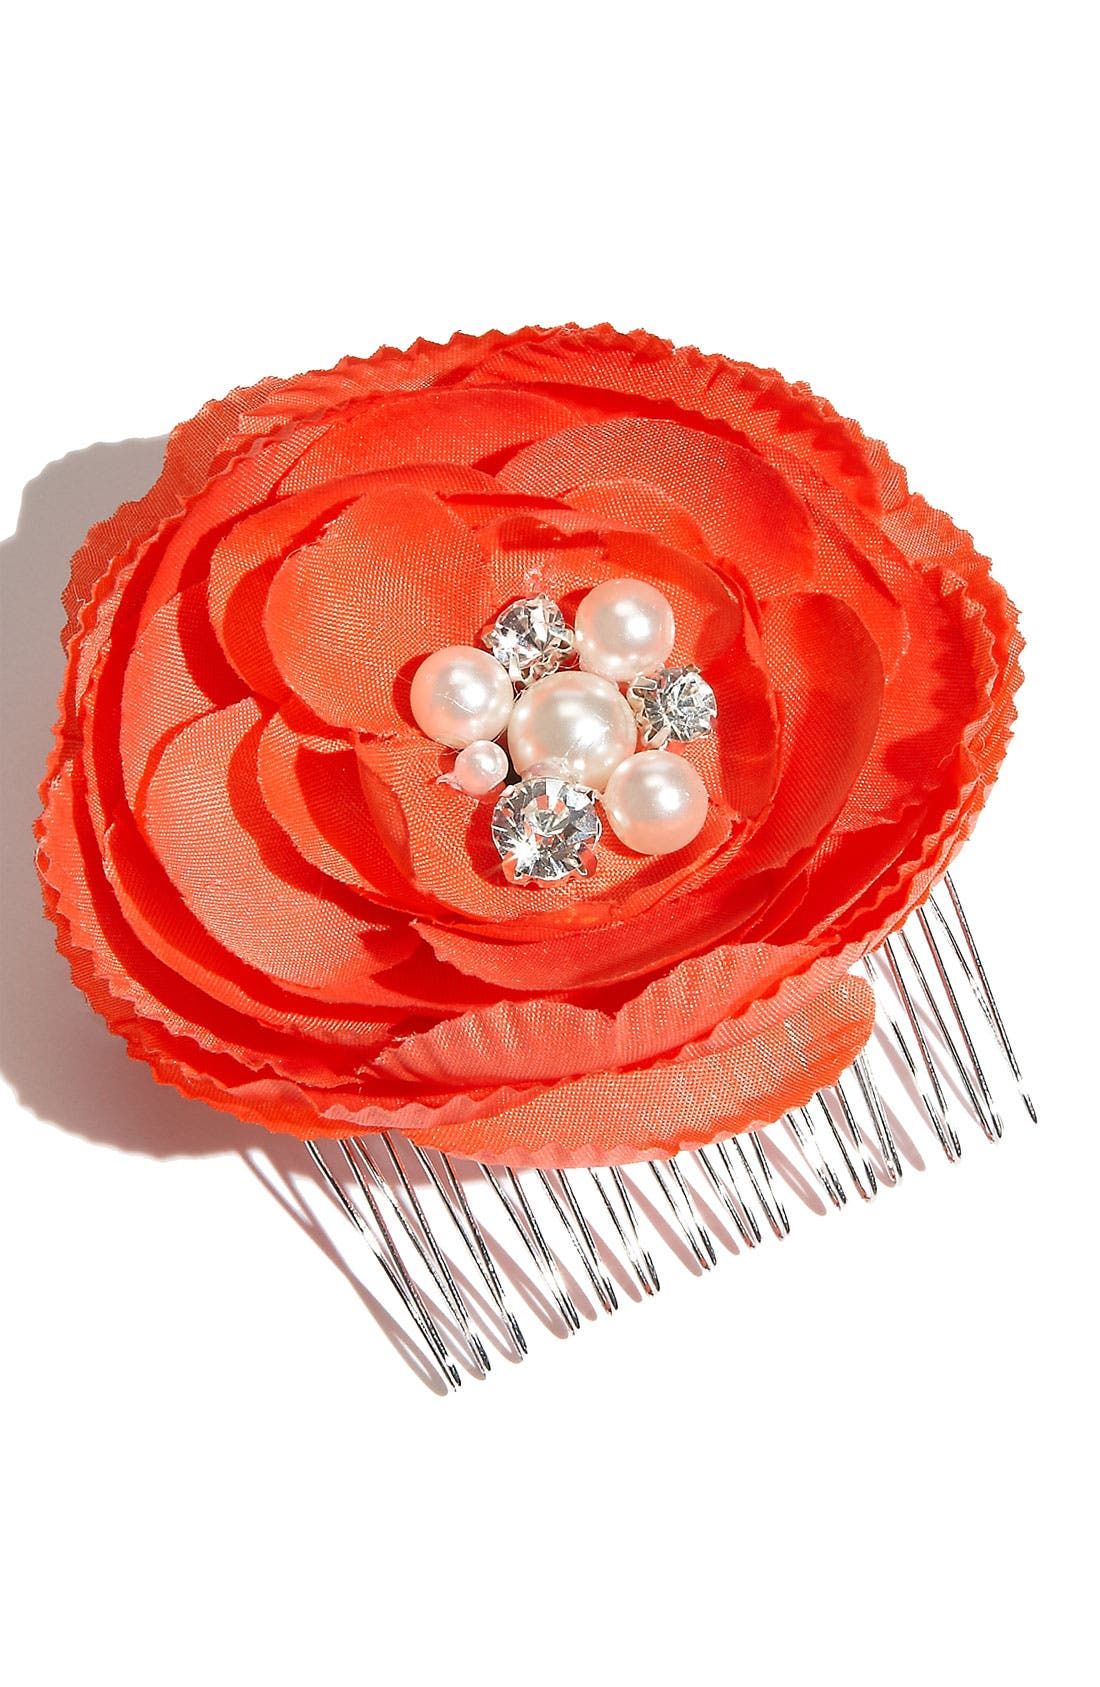 Alternate Image 1 Selected - Tasha Flower Hair Comb